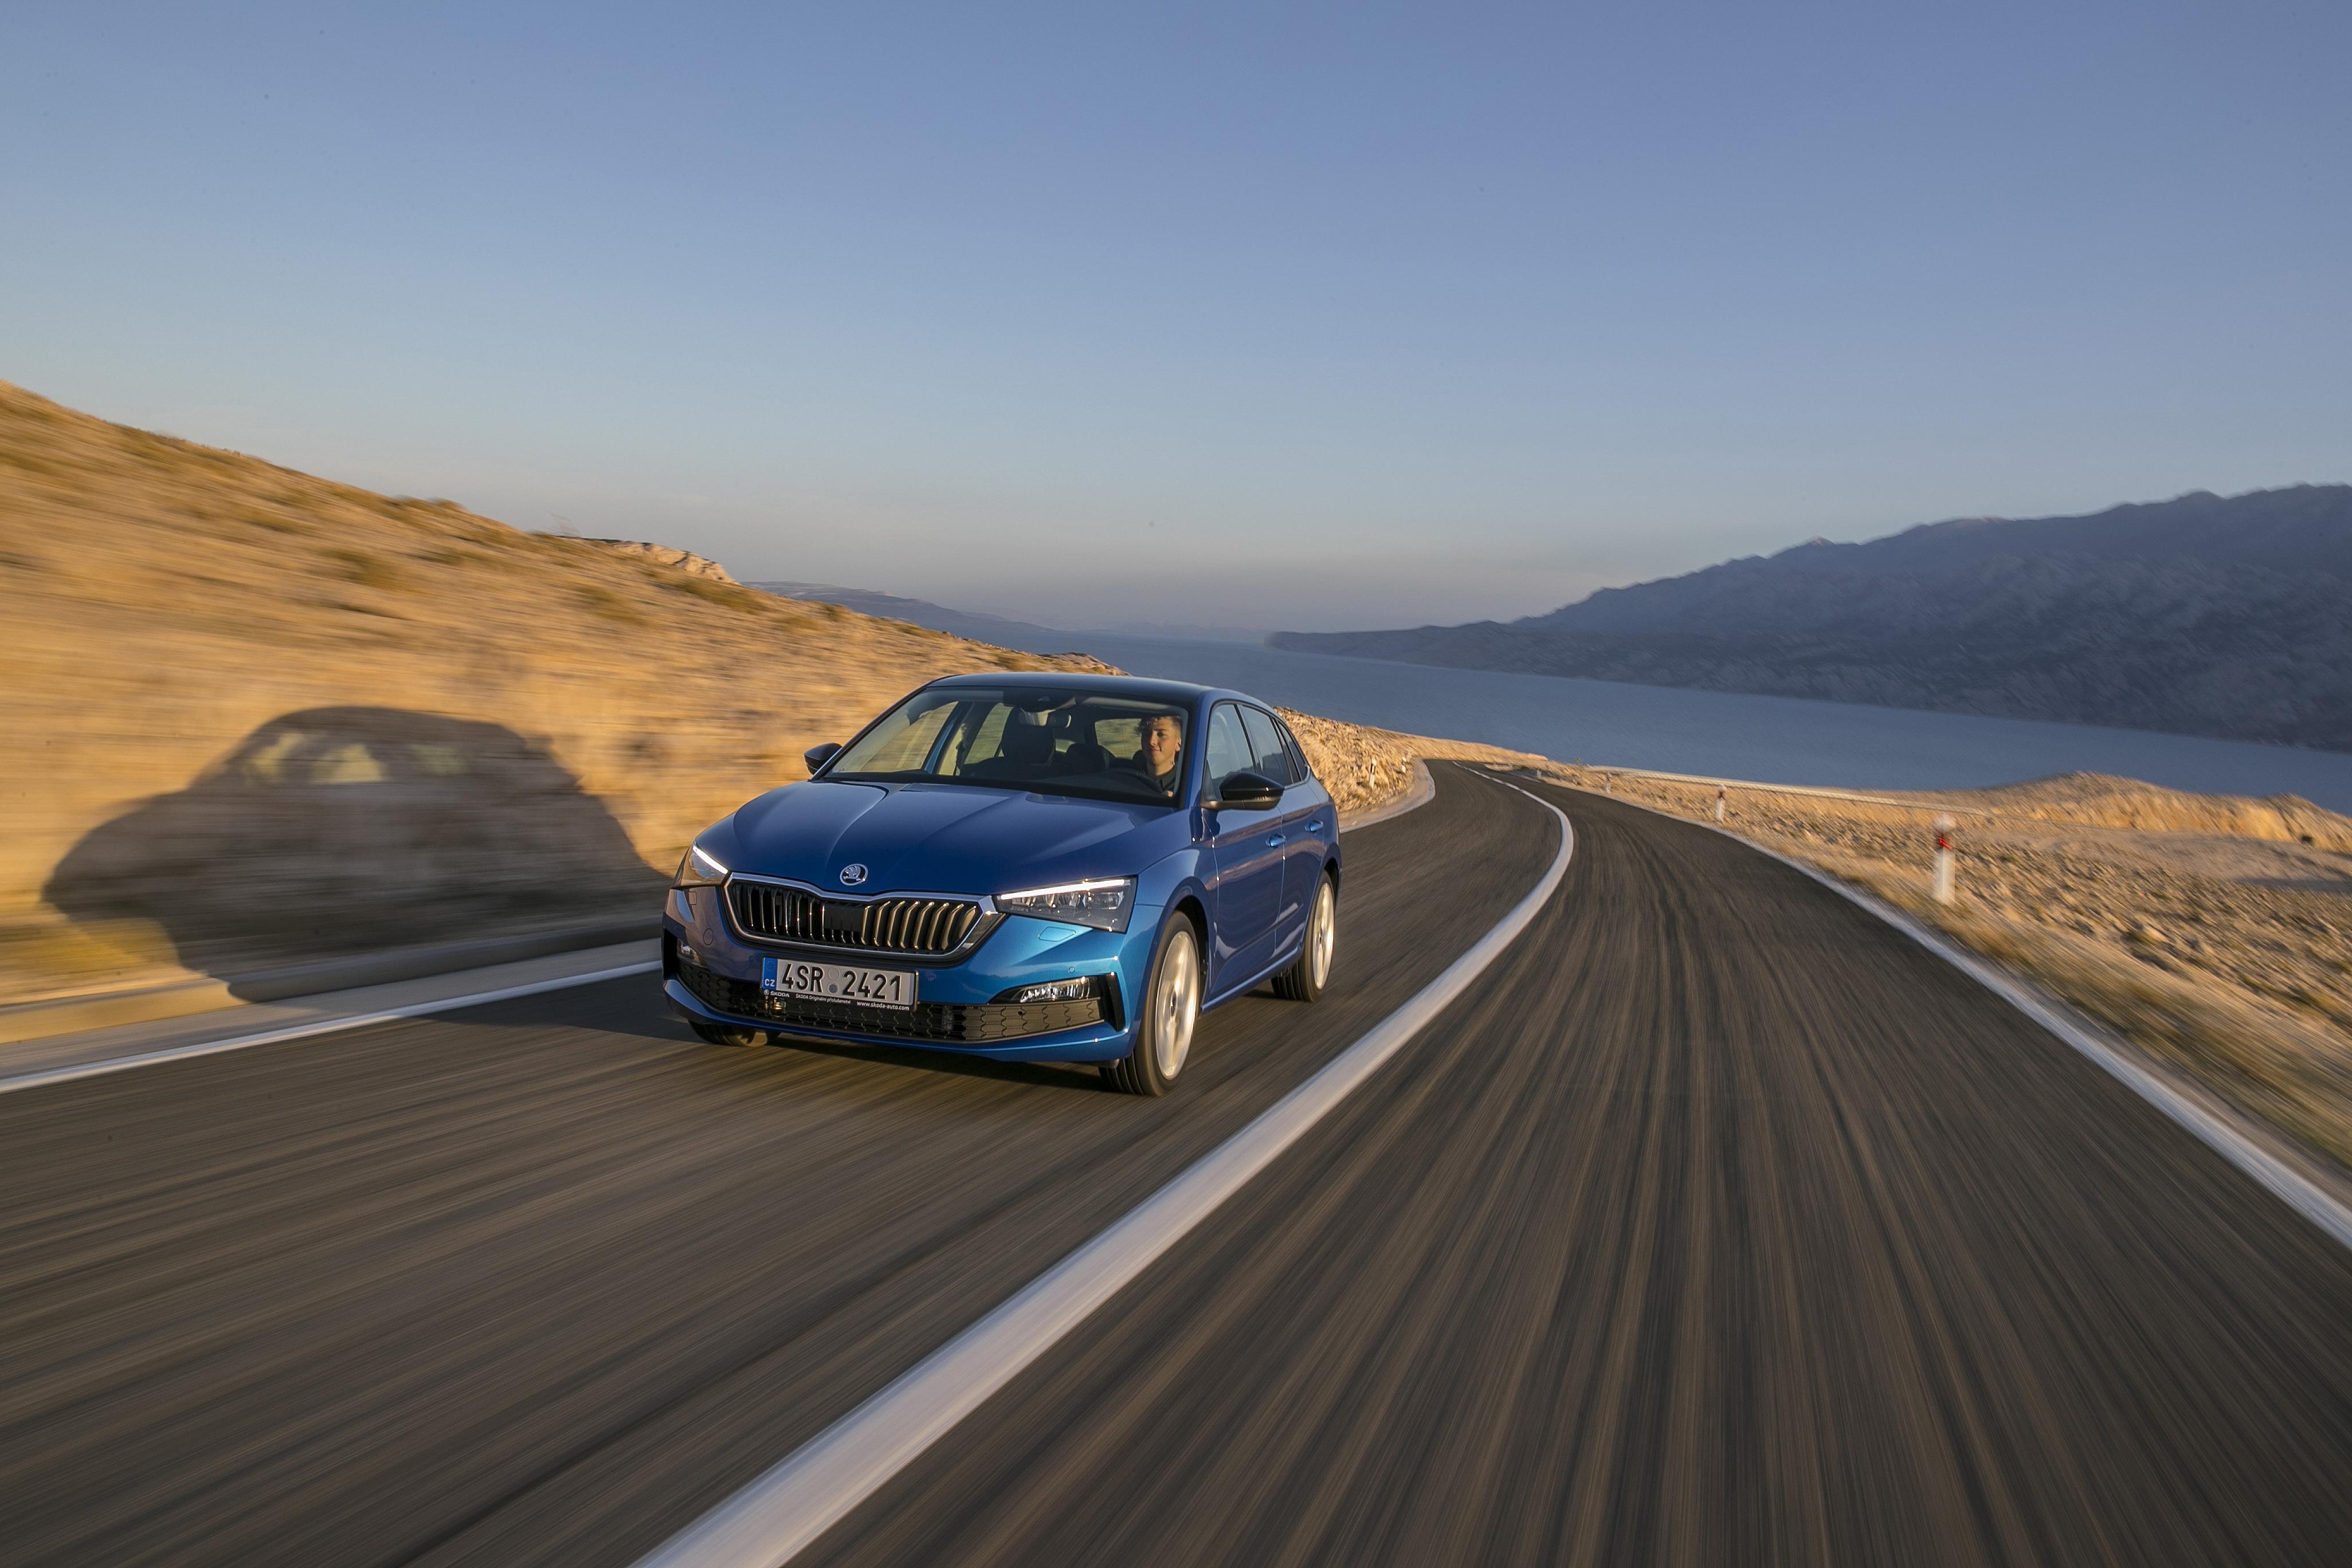 ŠKODA SCALA sets new benchmarks in the compact car segment